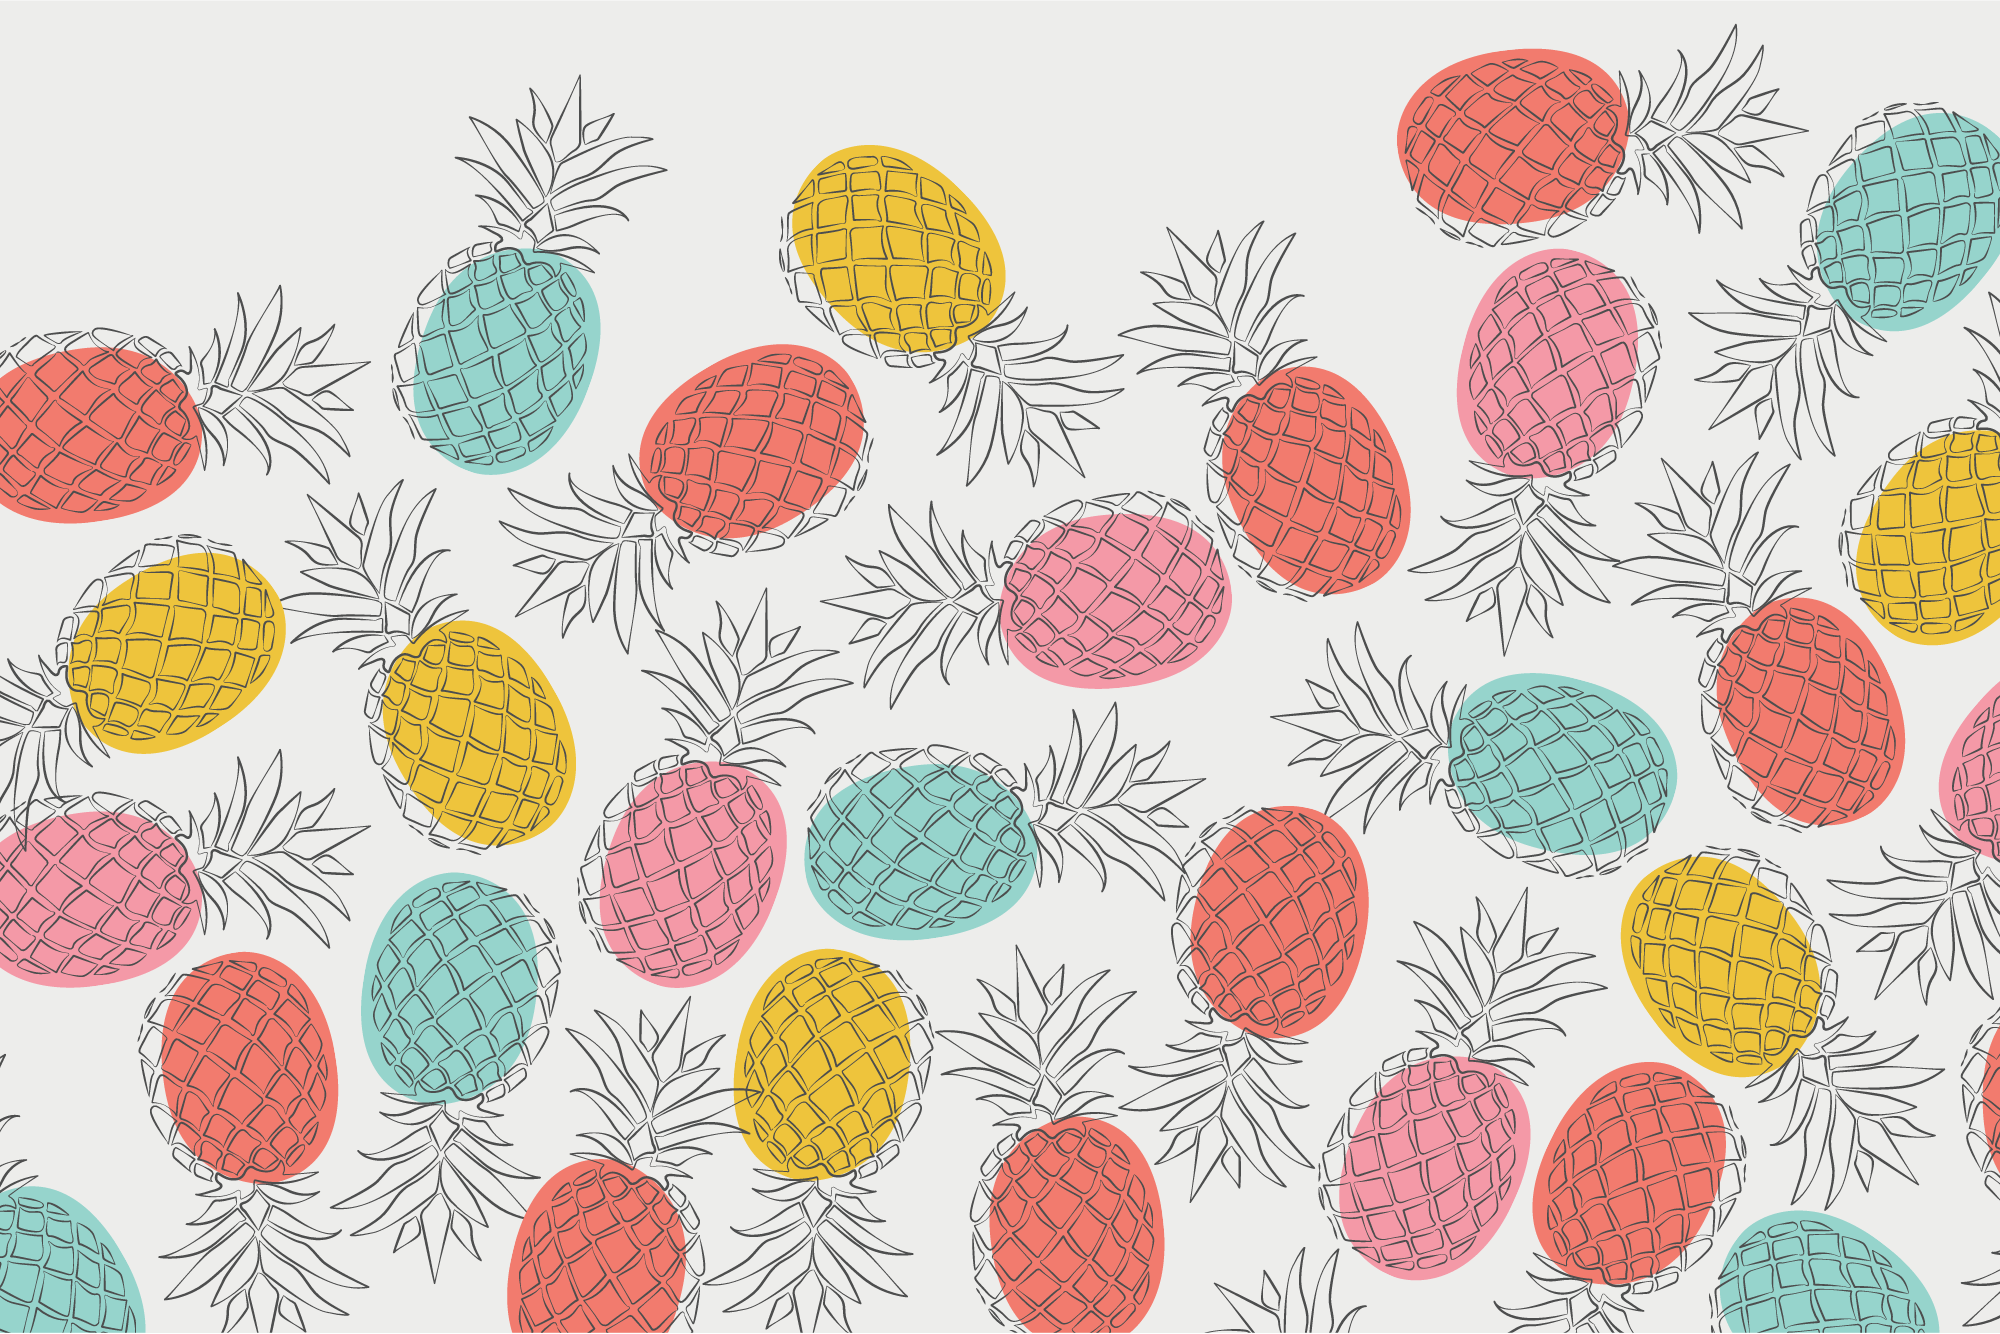 Artboard 5pineapple=collective---jenn-wilson-design.png